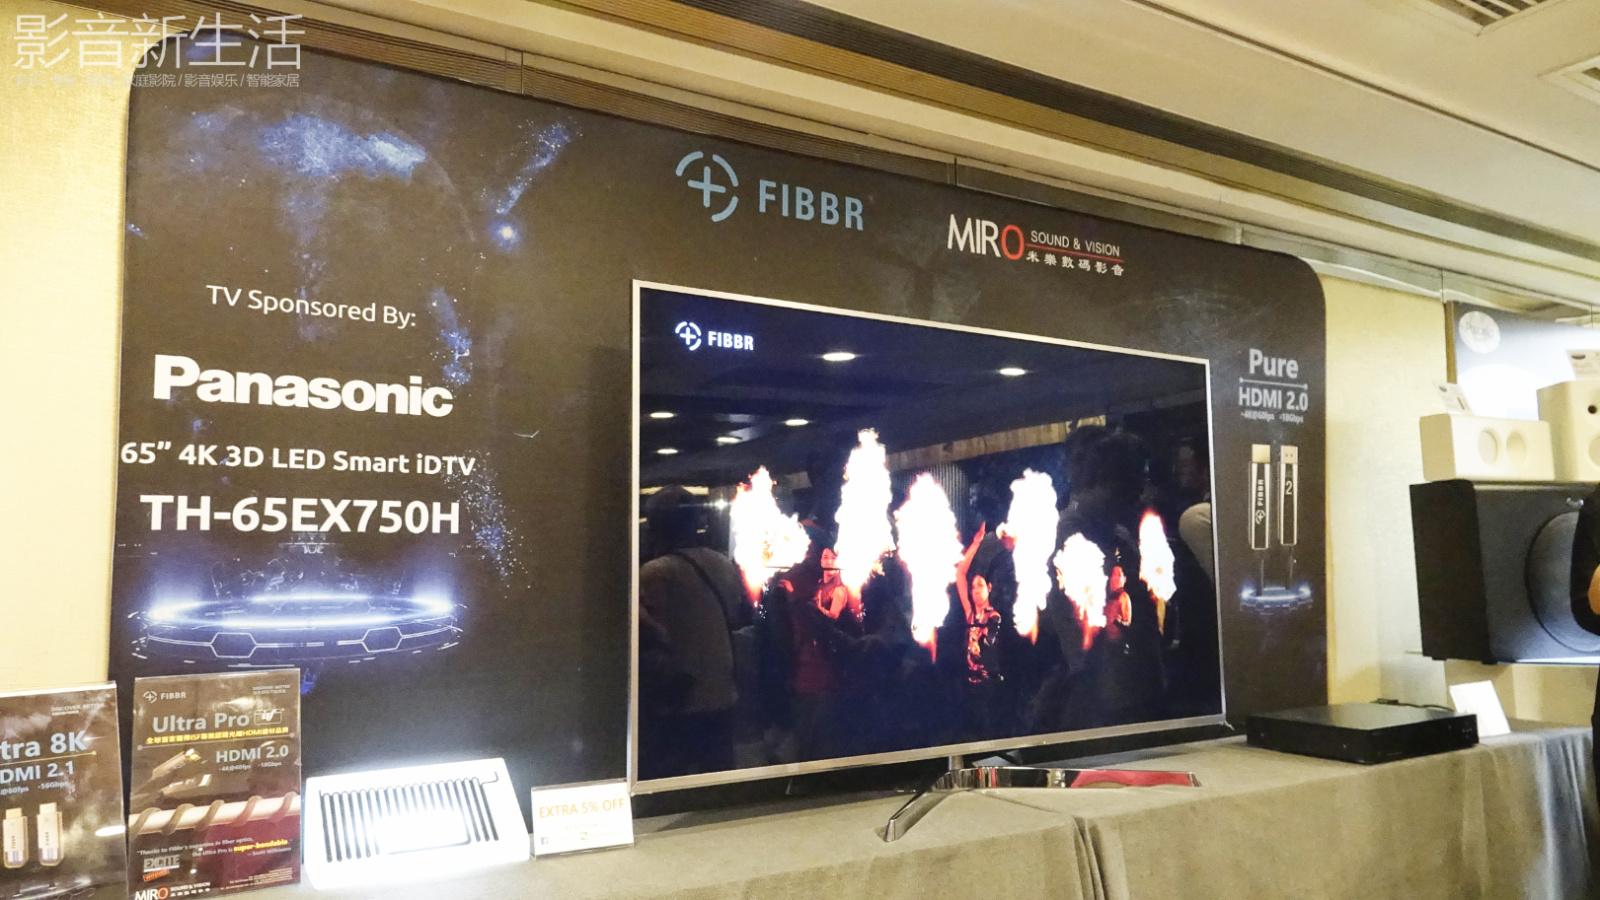 "DSC1236 - 推荐 | ""衰减率低、可弯折、耐用度高,高品质的HDMI线""FIBBR Ultra Pro 光纤HDMI线"